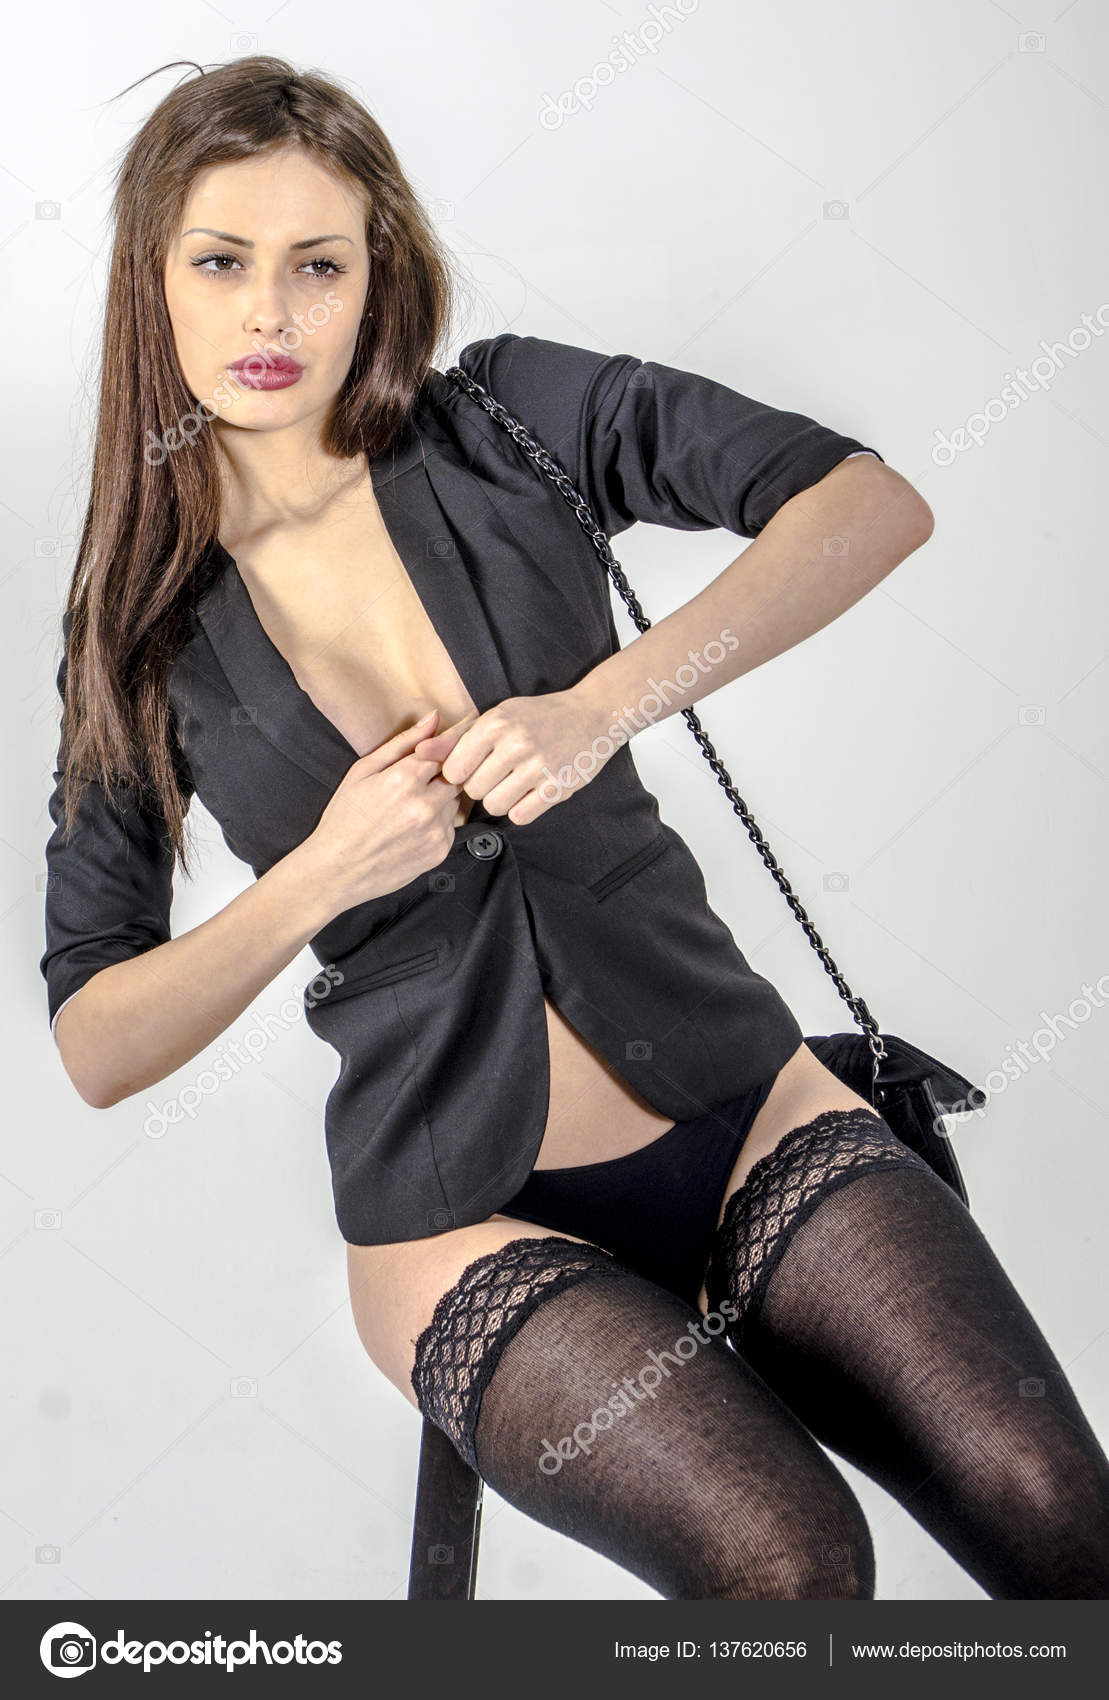 фото в обтяжку девушки